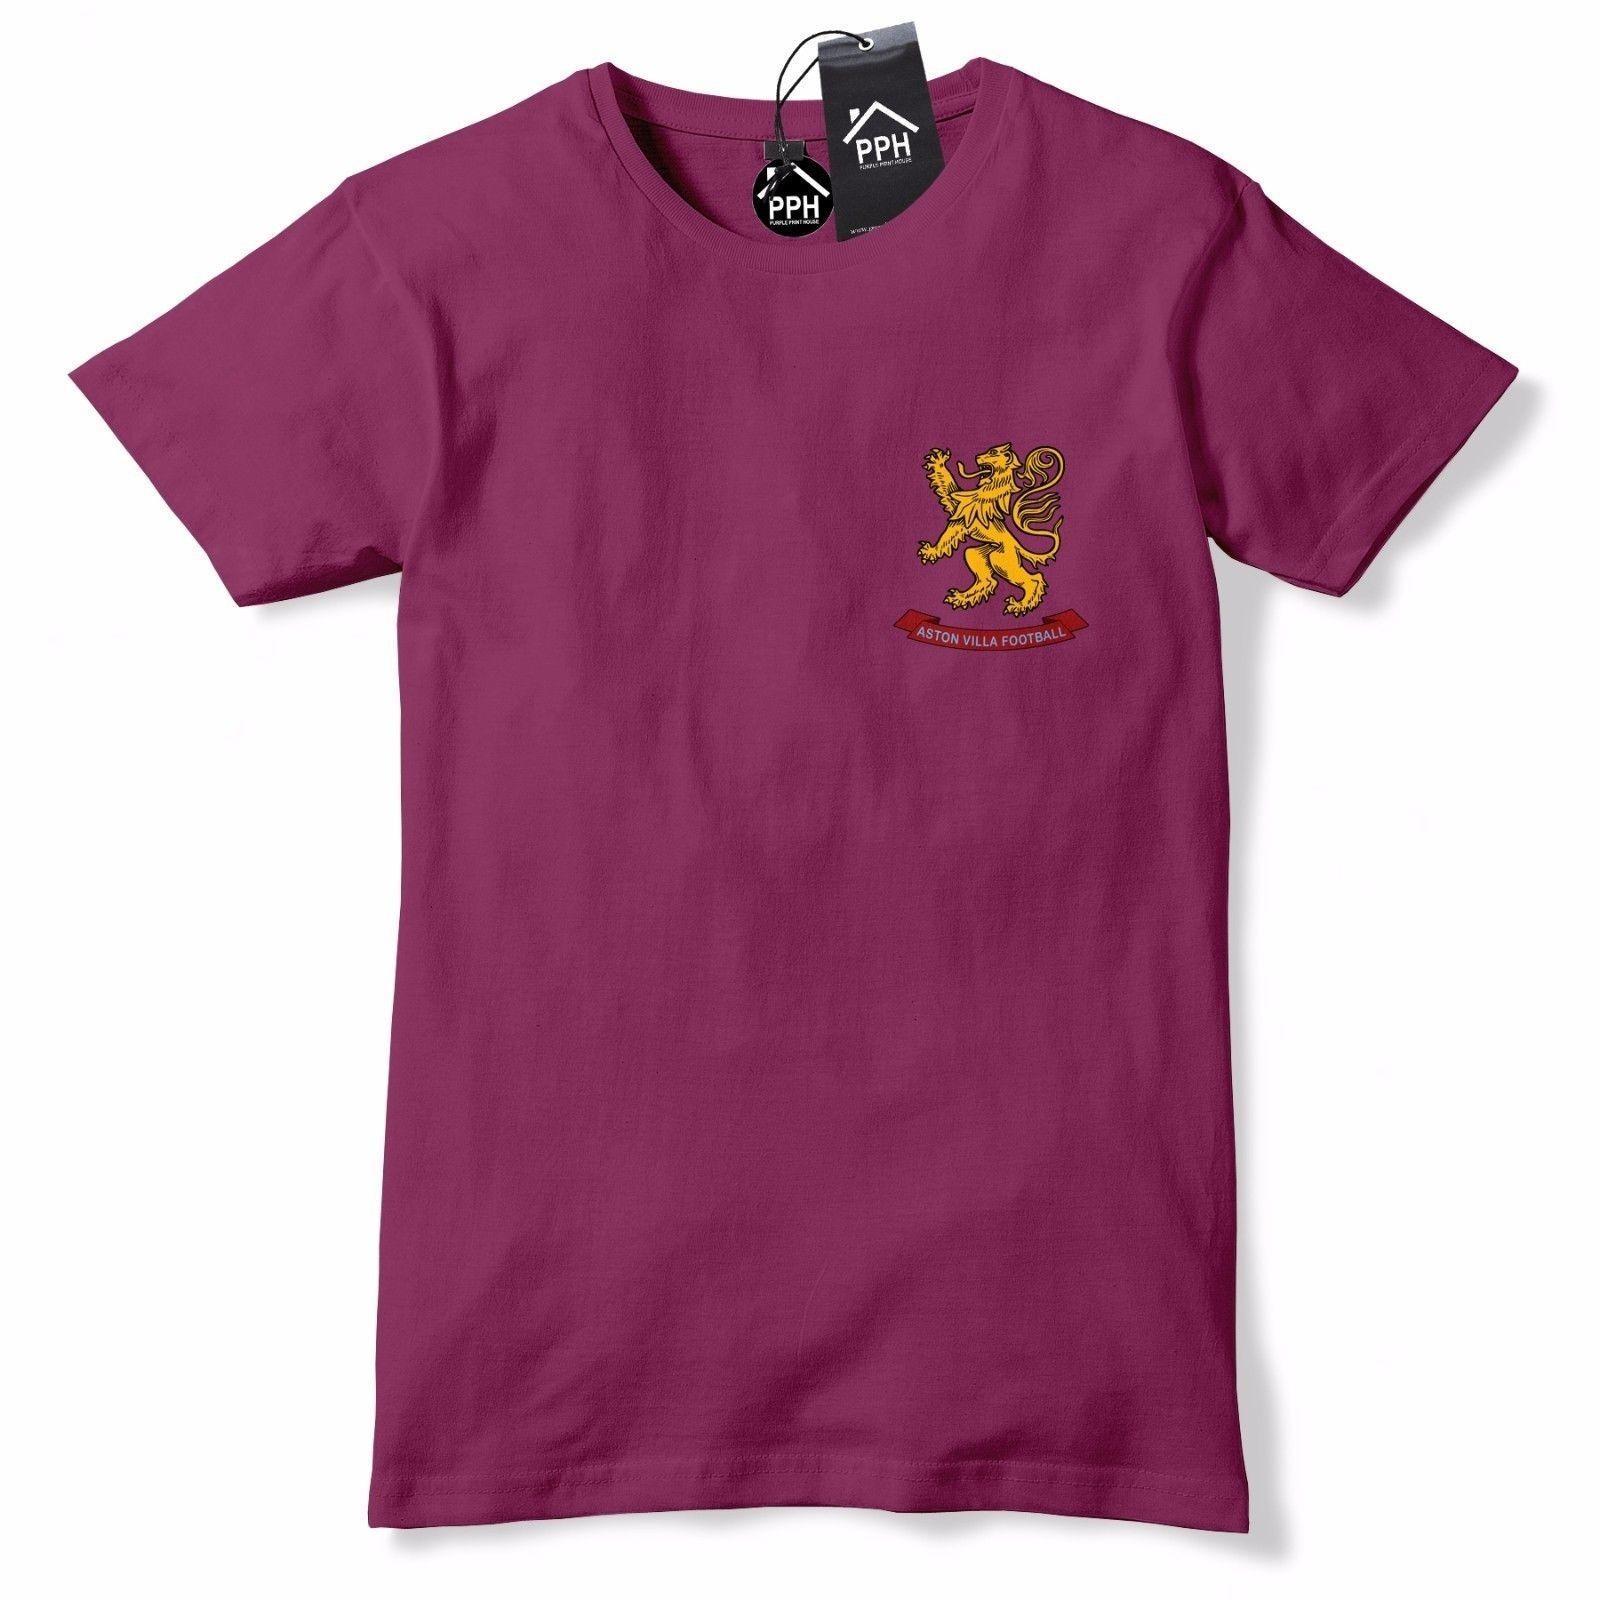 Compre Insignia De Fútbol Retro Aston Villa Camisa 1950 Claret Azul Camiseta  Escudo De Armas 591 Envío Gratis Divertido Camiseta Unisex A  12.96 Del ... 7d553c839275b